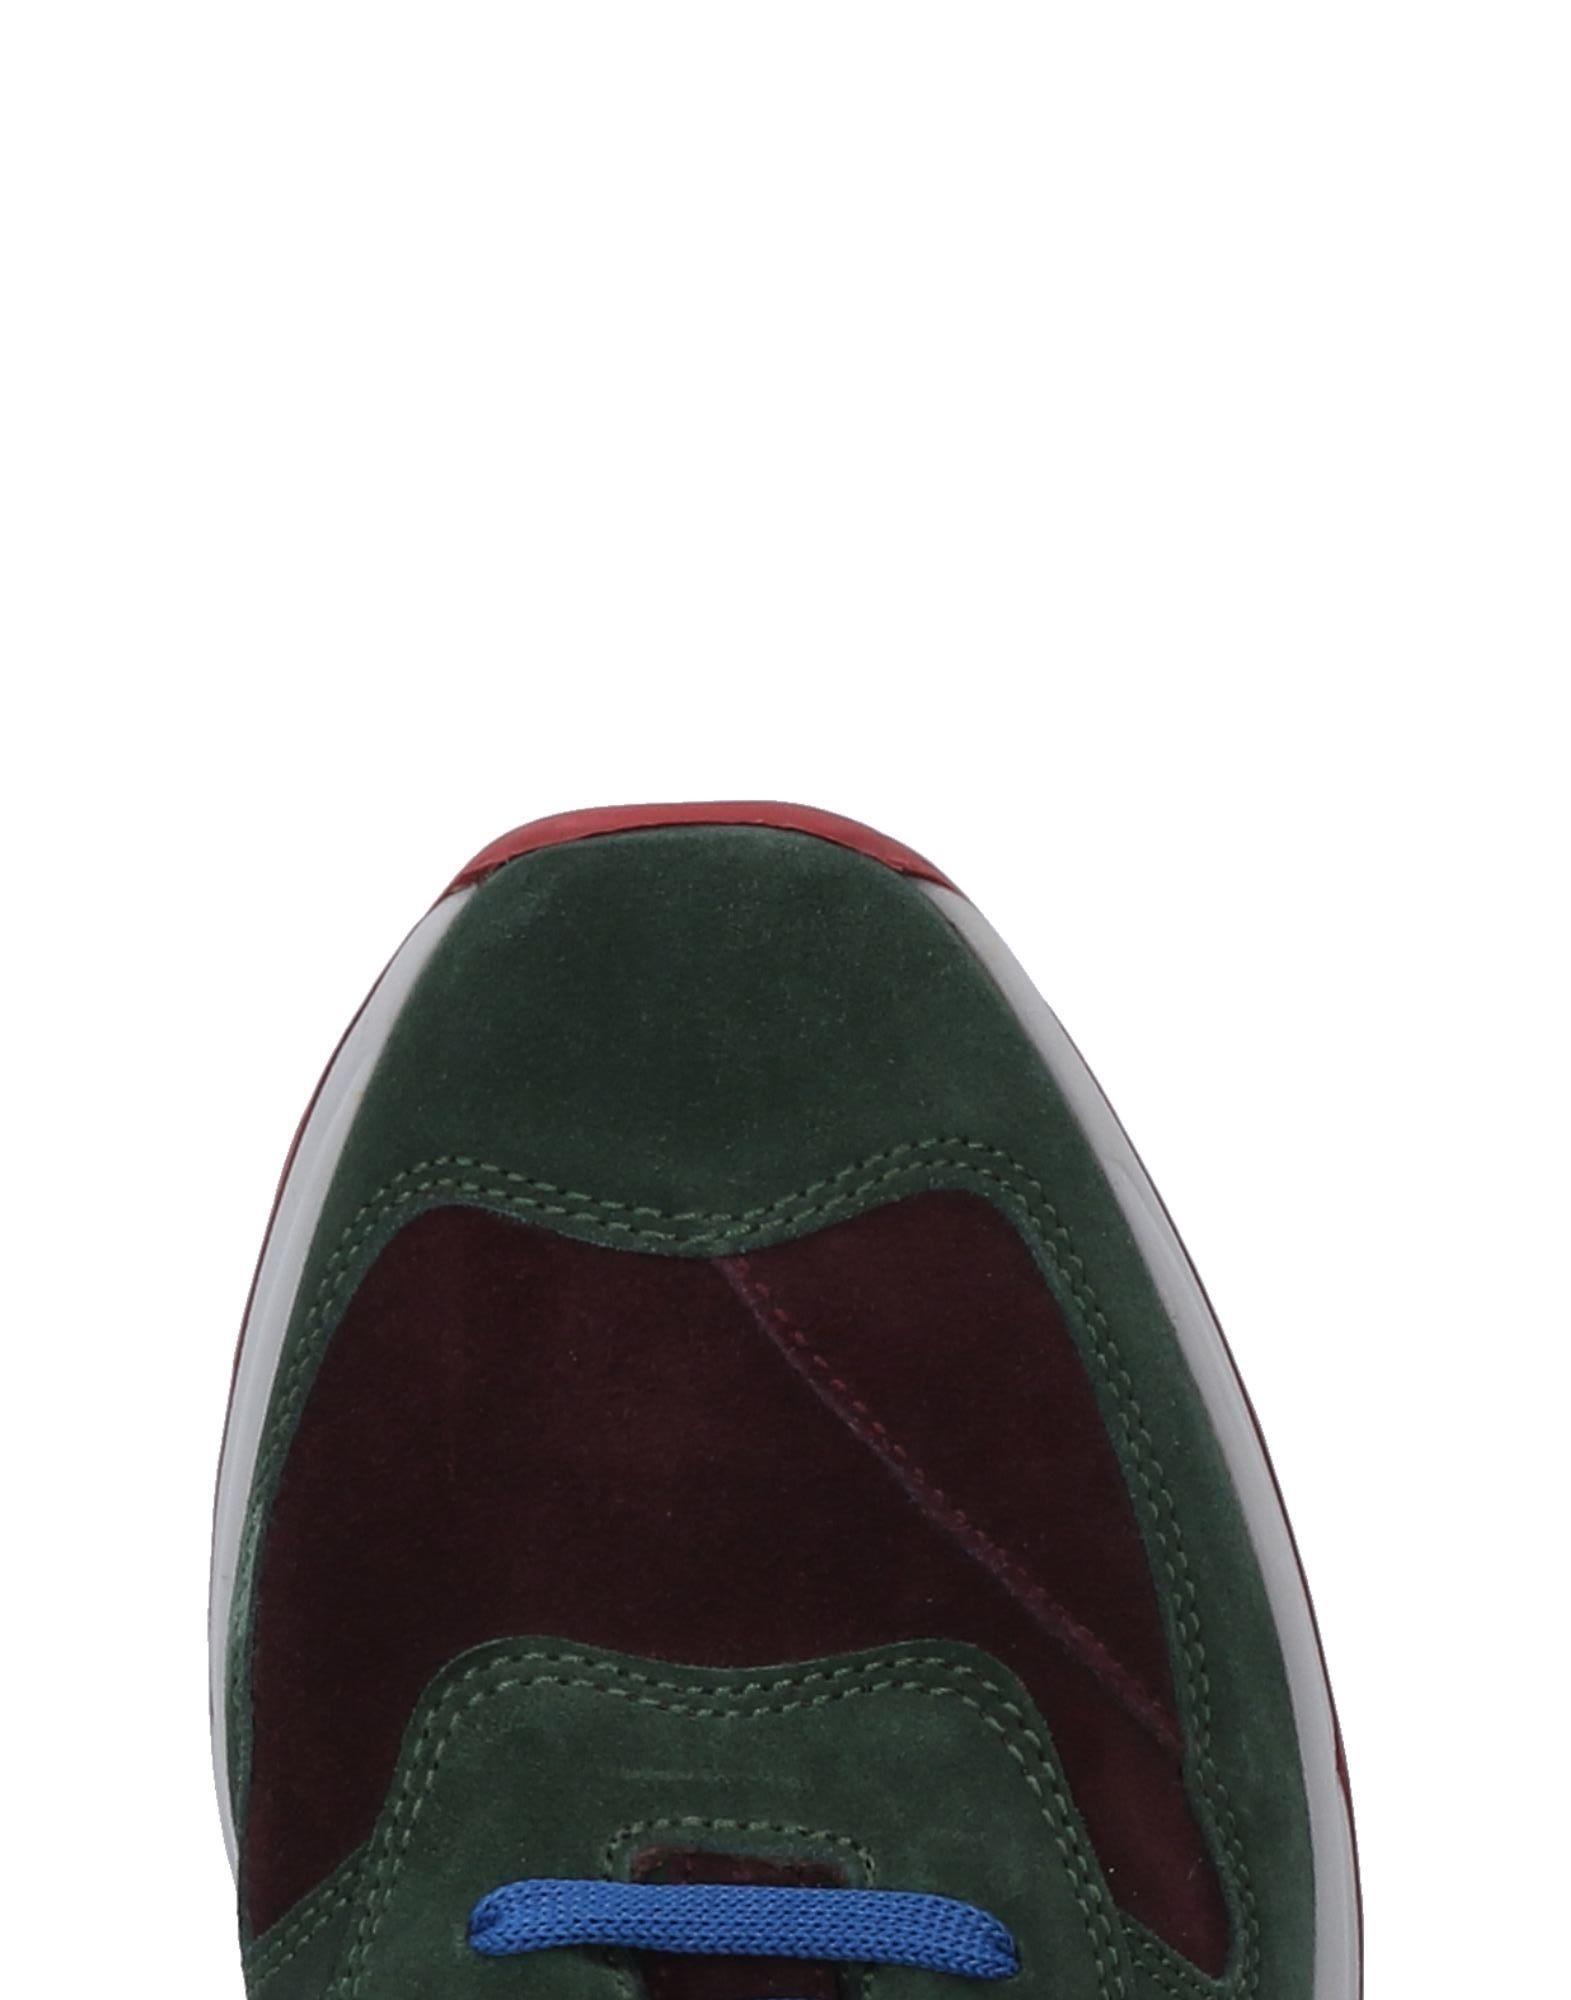 Dondup Sneakers Damen  11505692DFGut Schuhe aussehende strapazierfähige Schuhe 11505692DFGut f1a416